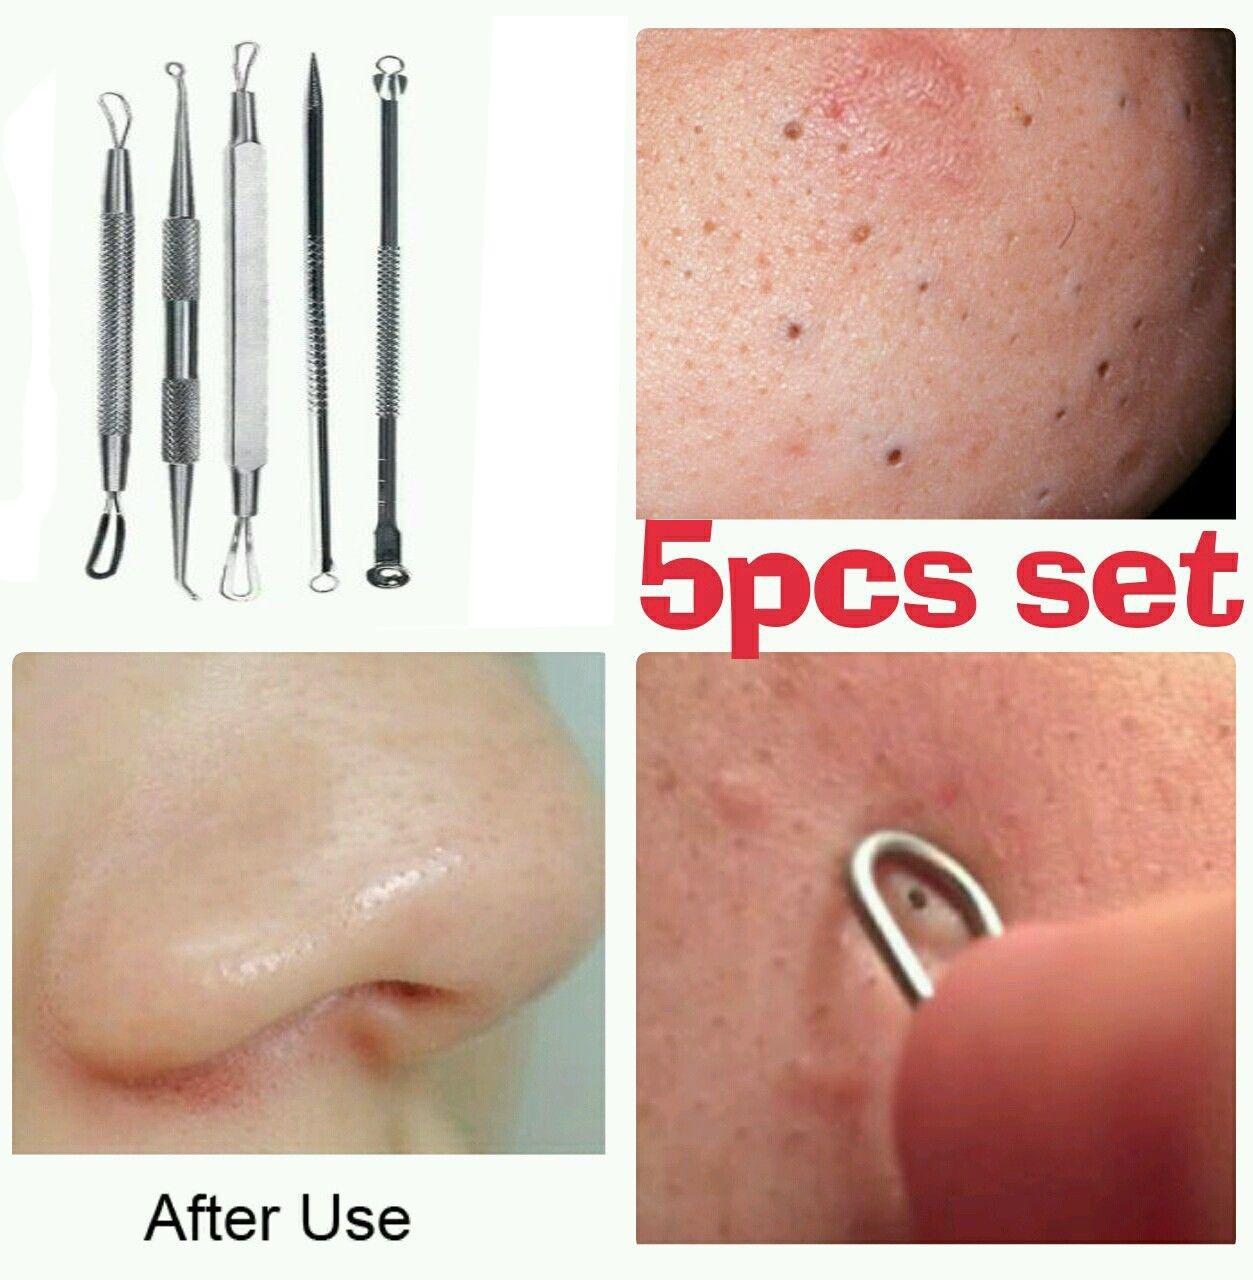 5pcs Blackhead Acne Whitehead Pimple Blemish Extractor Remover Tool Set Badger - Lip Balm Stick Highland Mint - 0.15 oz. (pack of 4)